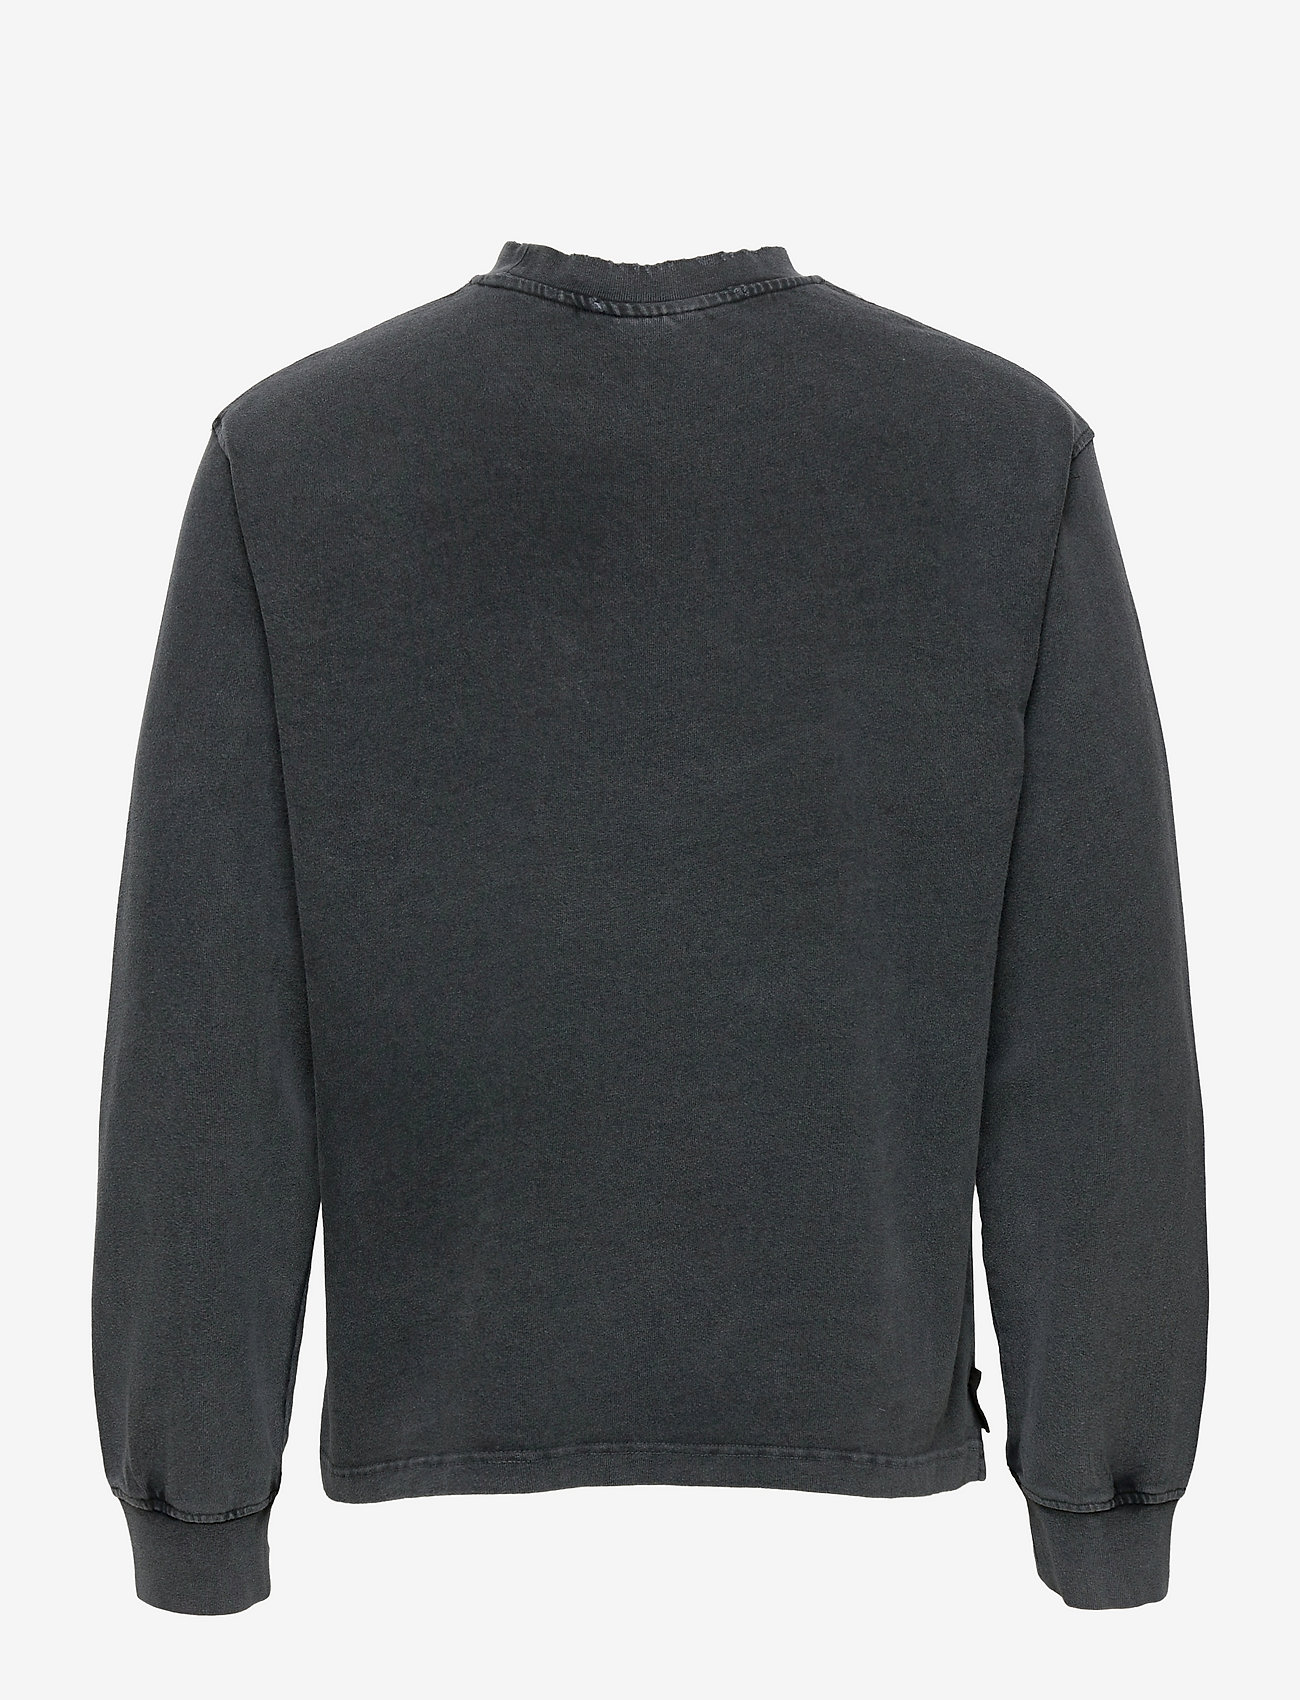 HAN Kjøbenhavn - Distressed Tee Long Sleeve - basic t-shirts - distressed dark grey - 1